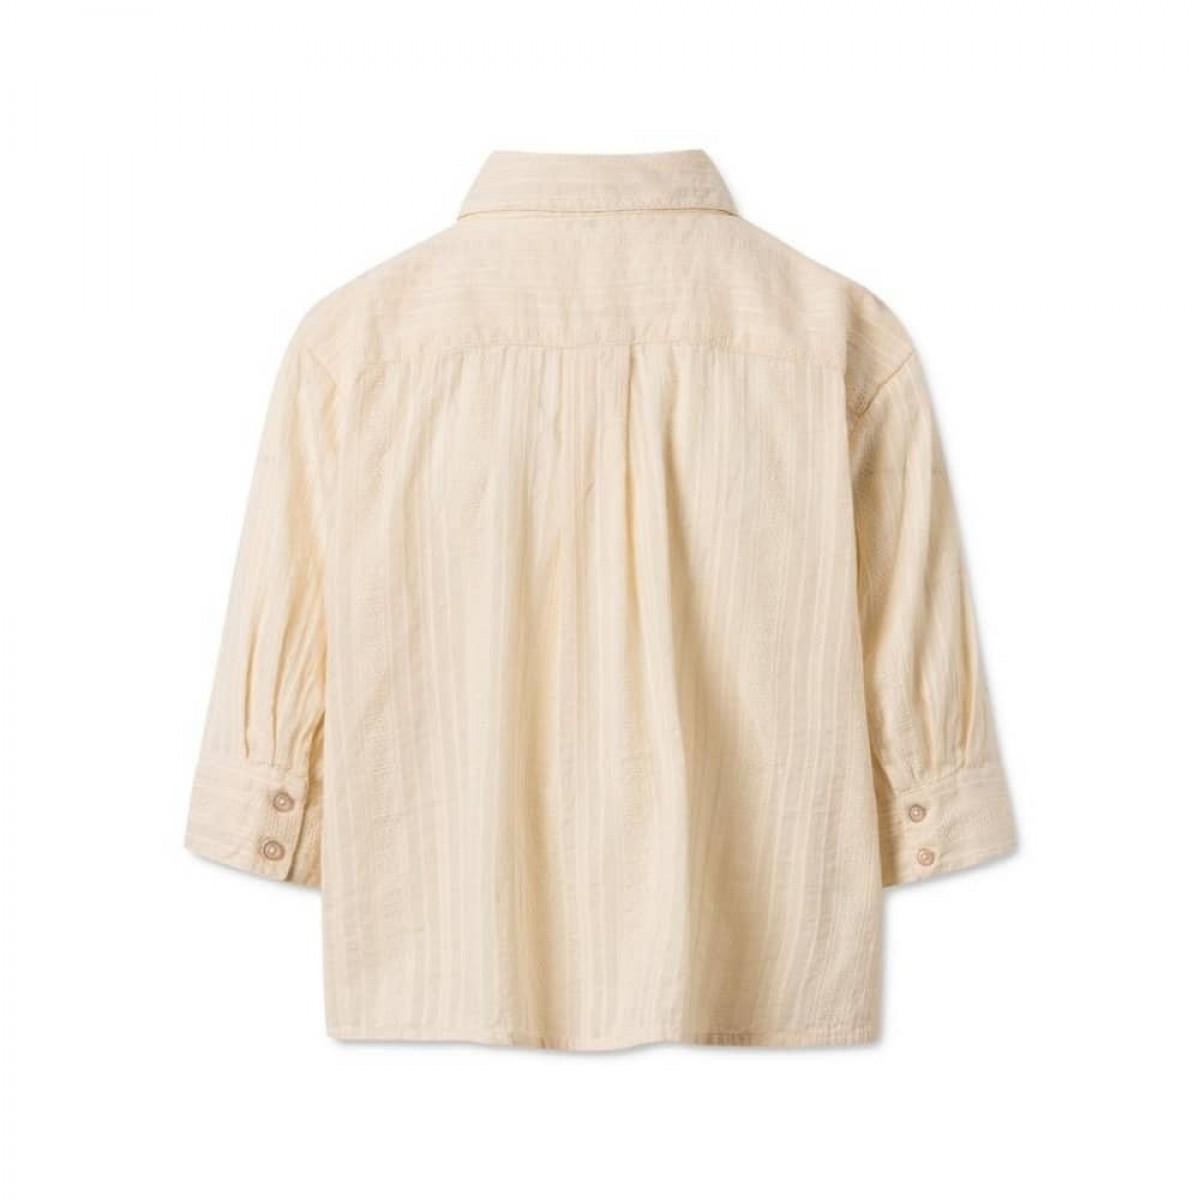 romala shirt - cream - ryggen